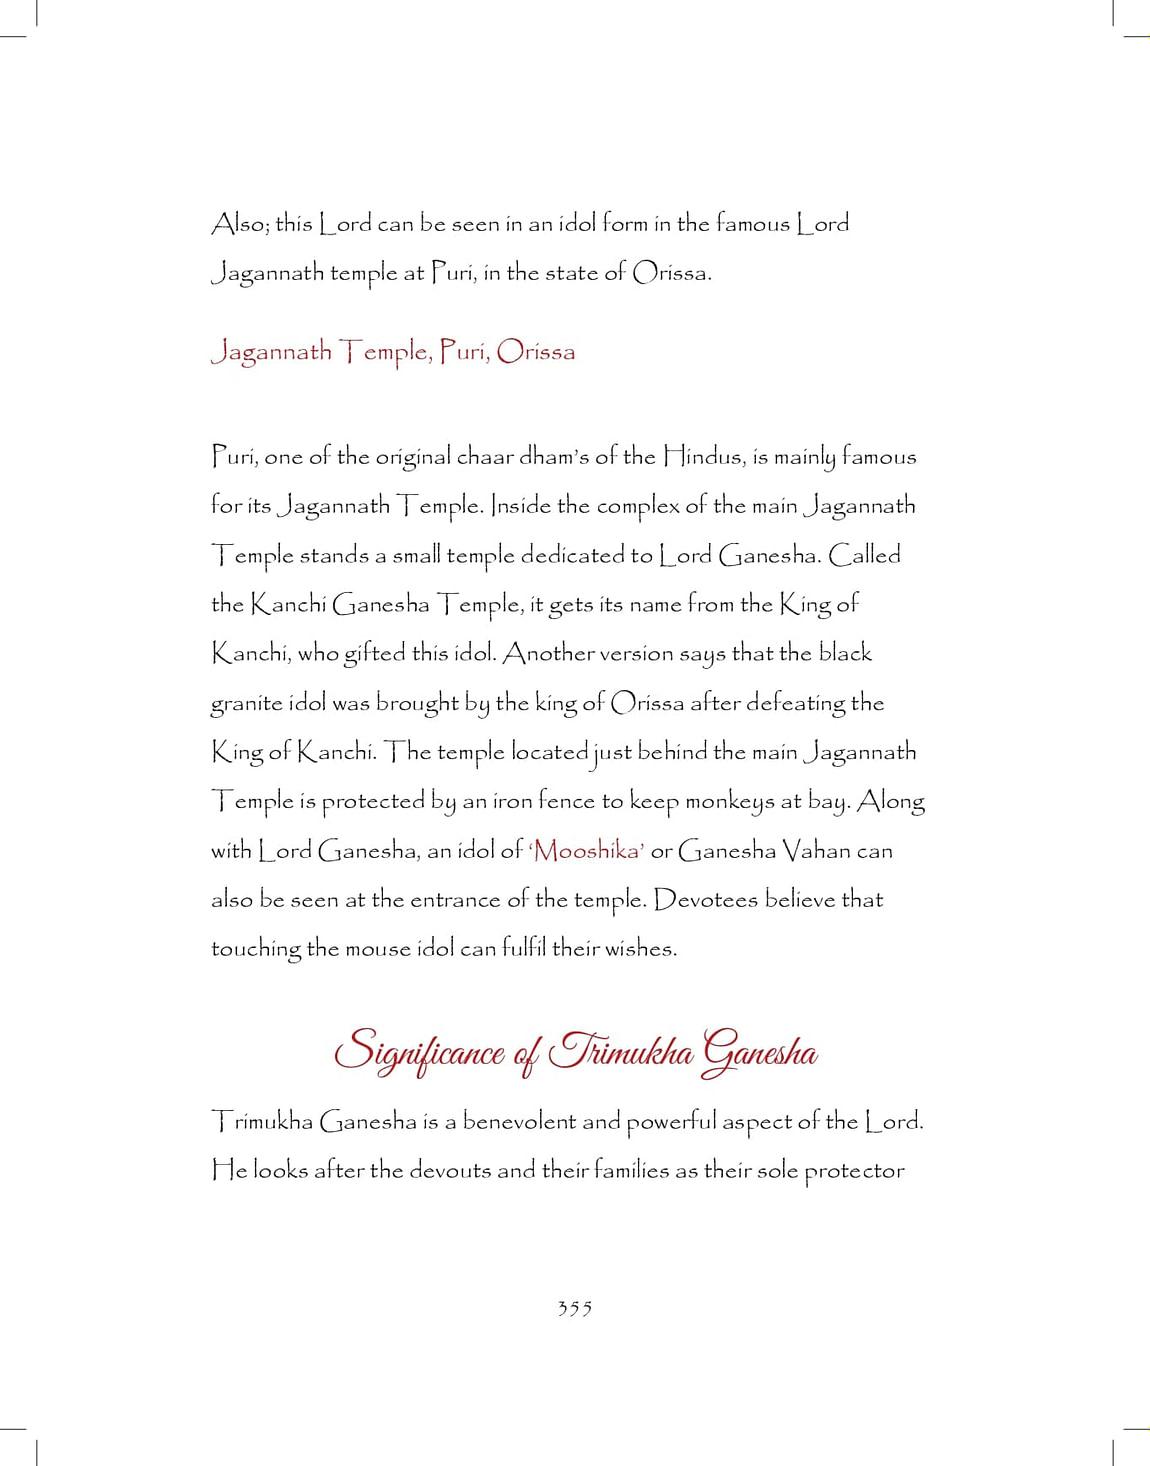 Ganesh-print_pages-to-jpg-0355.jpg